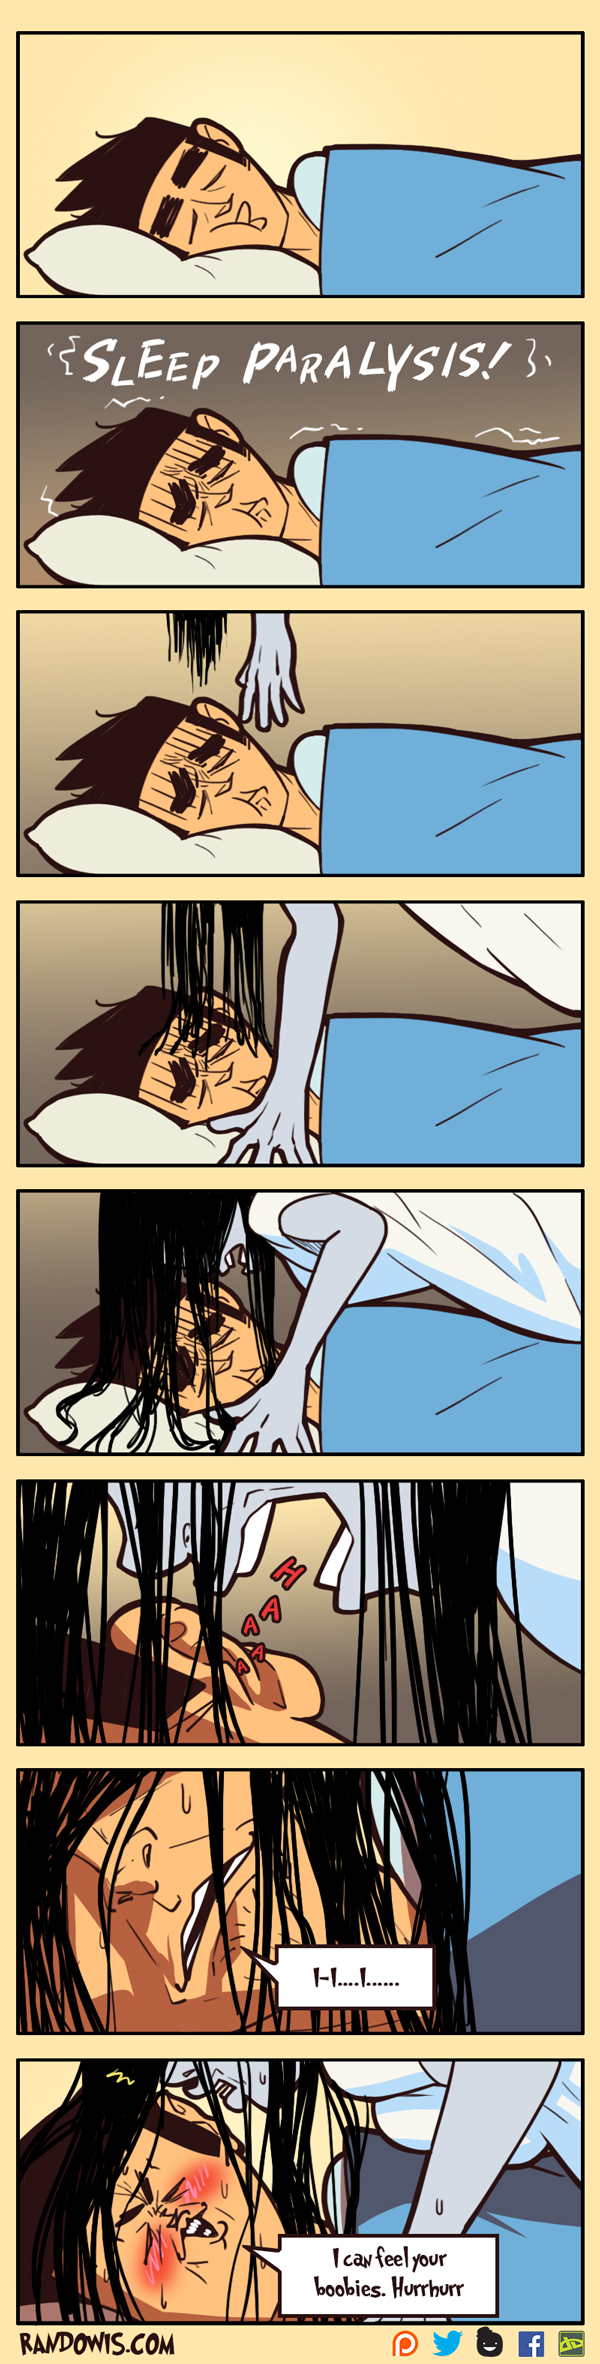 Sleep Paralysis by RandoWis